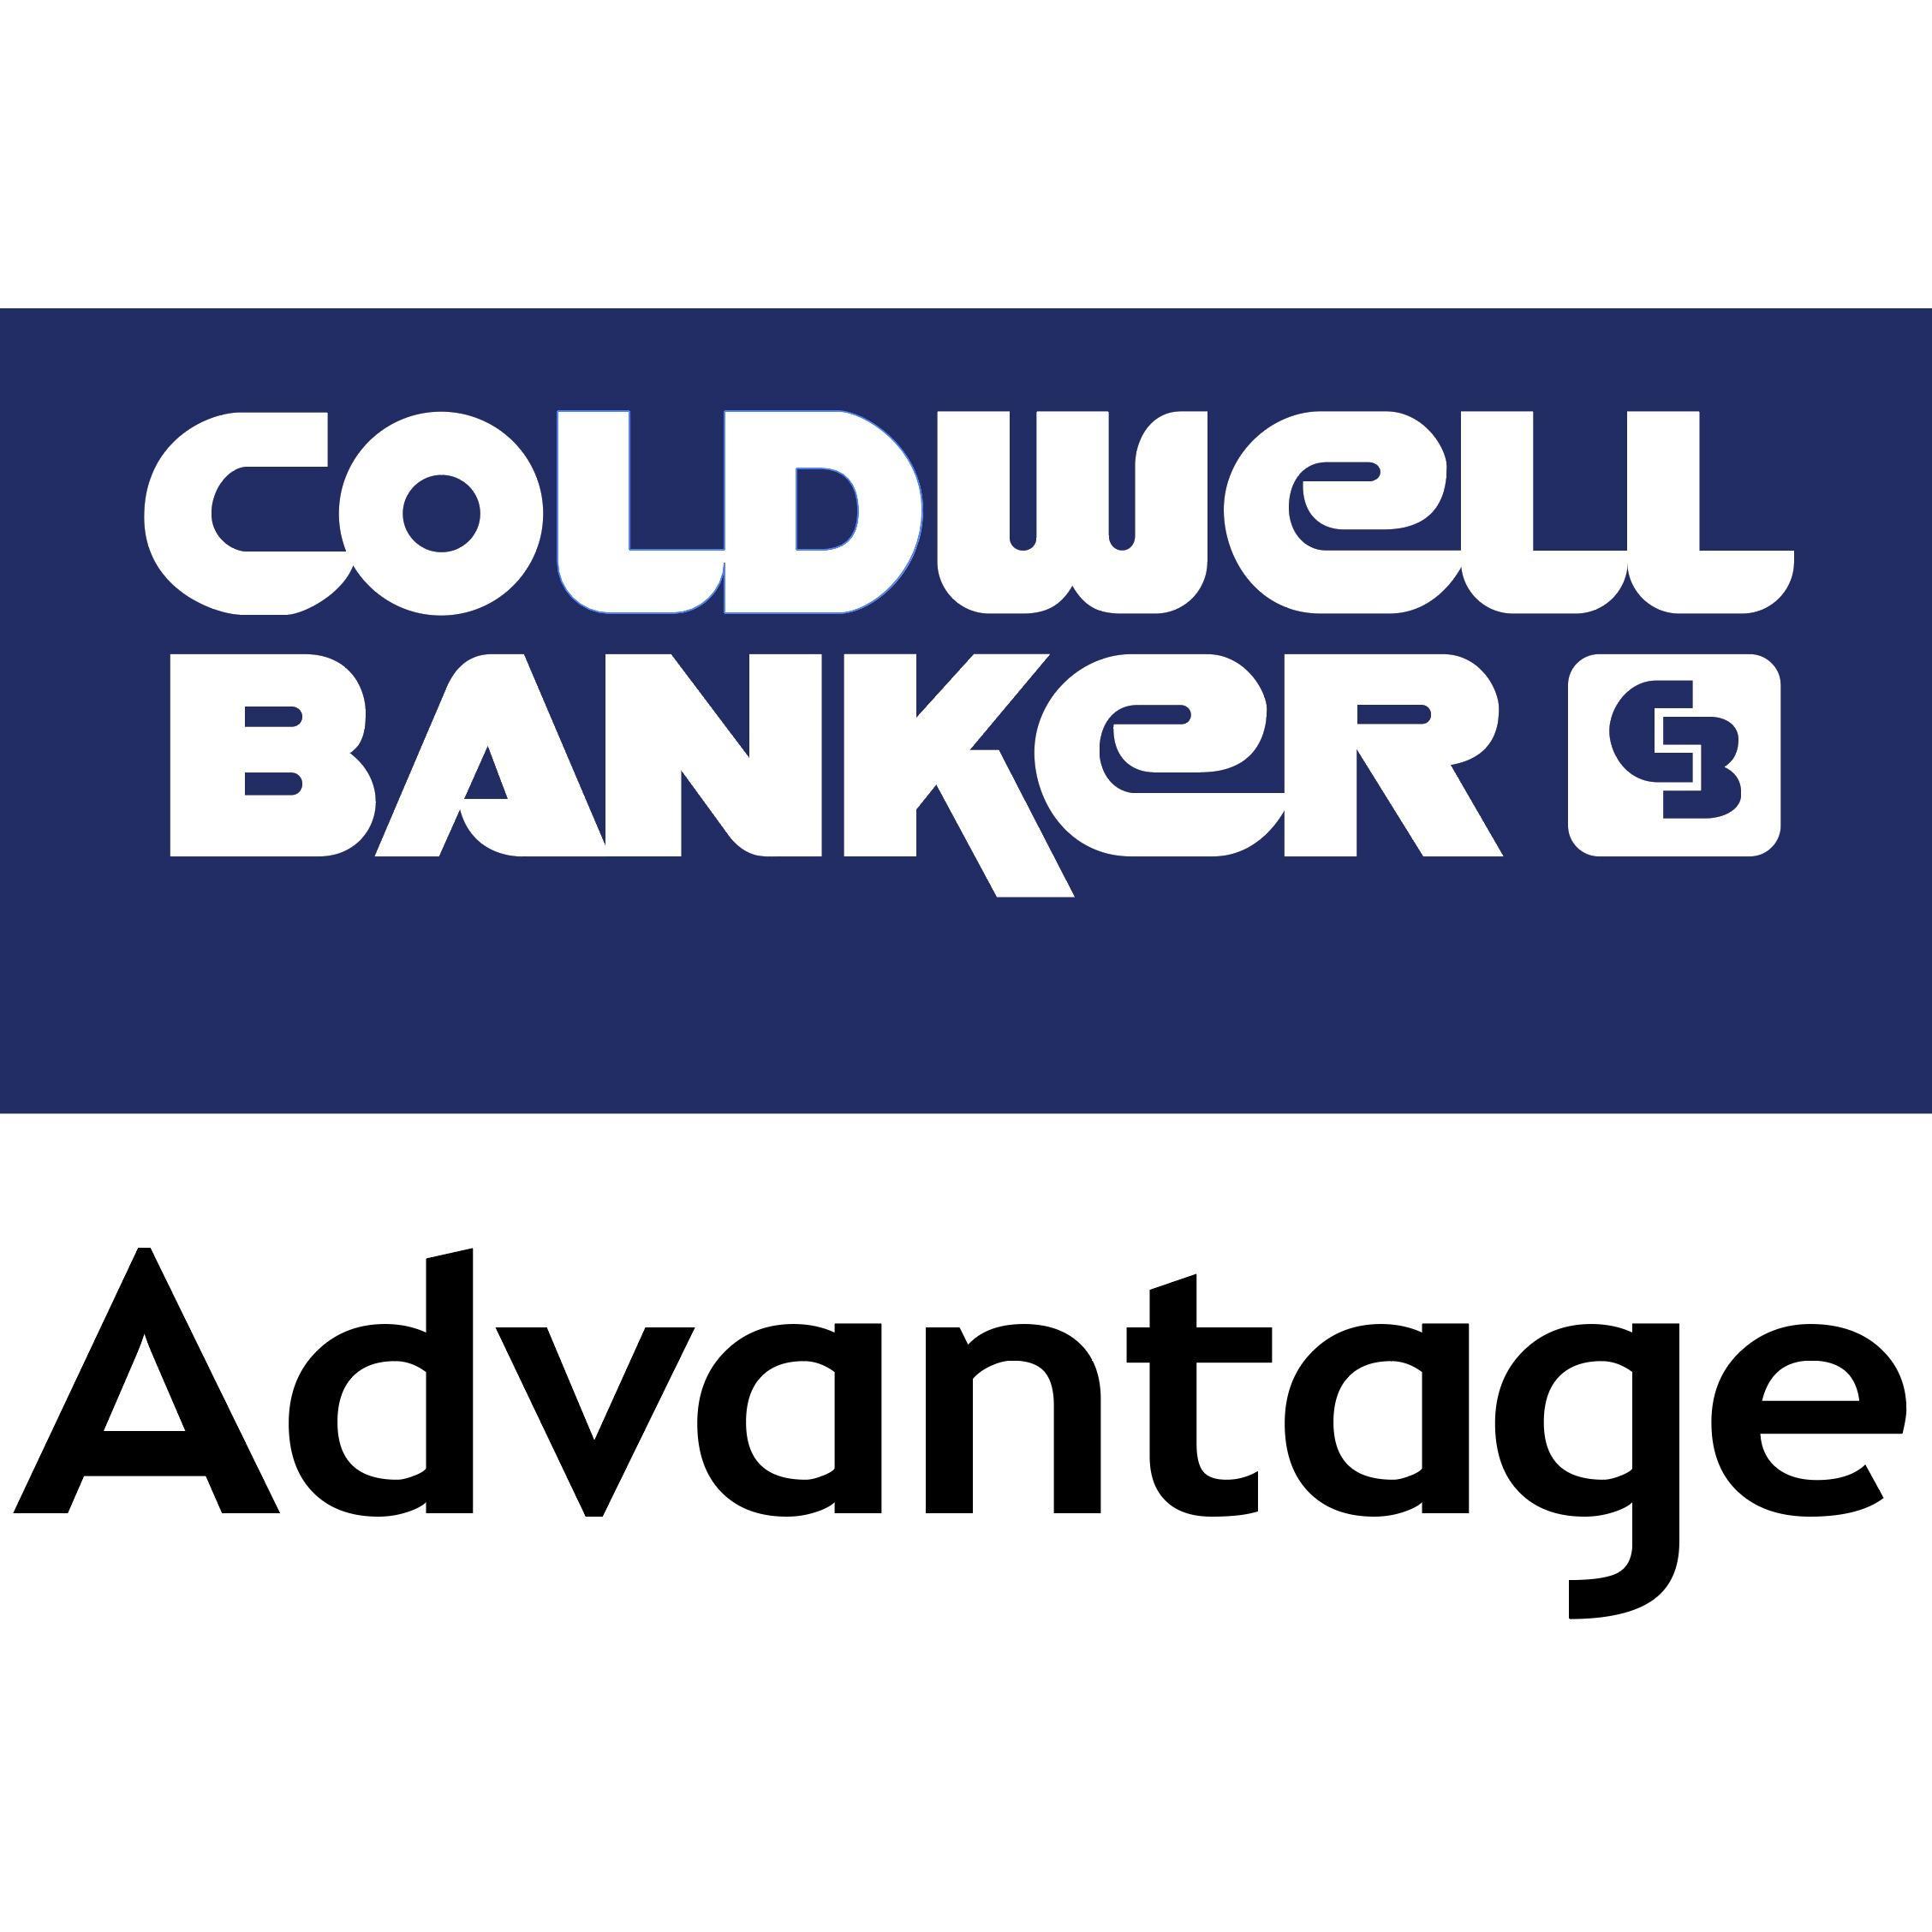 Amanda Bullock | Coldwell Banker Advantage